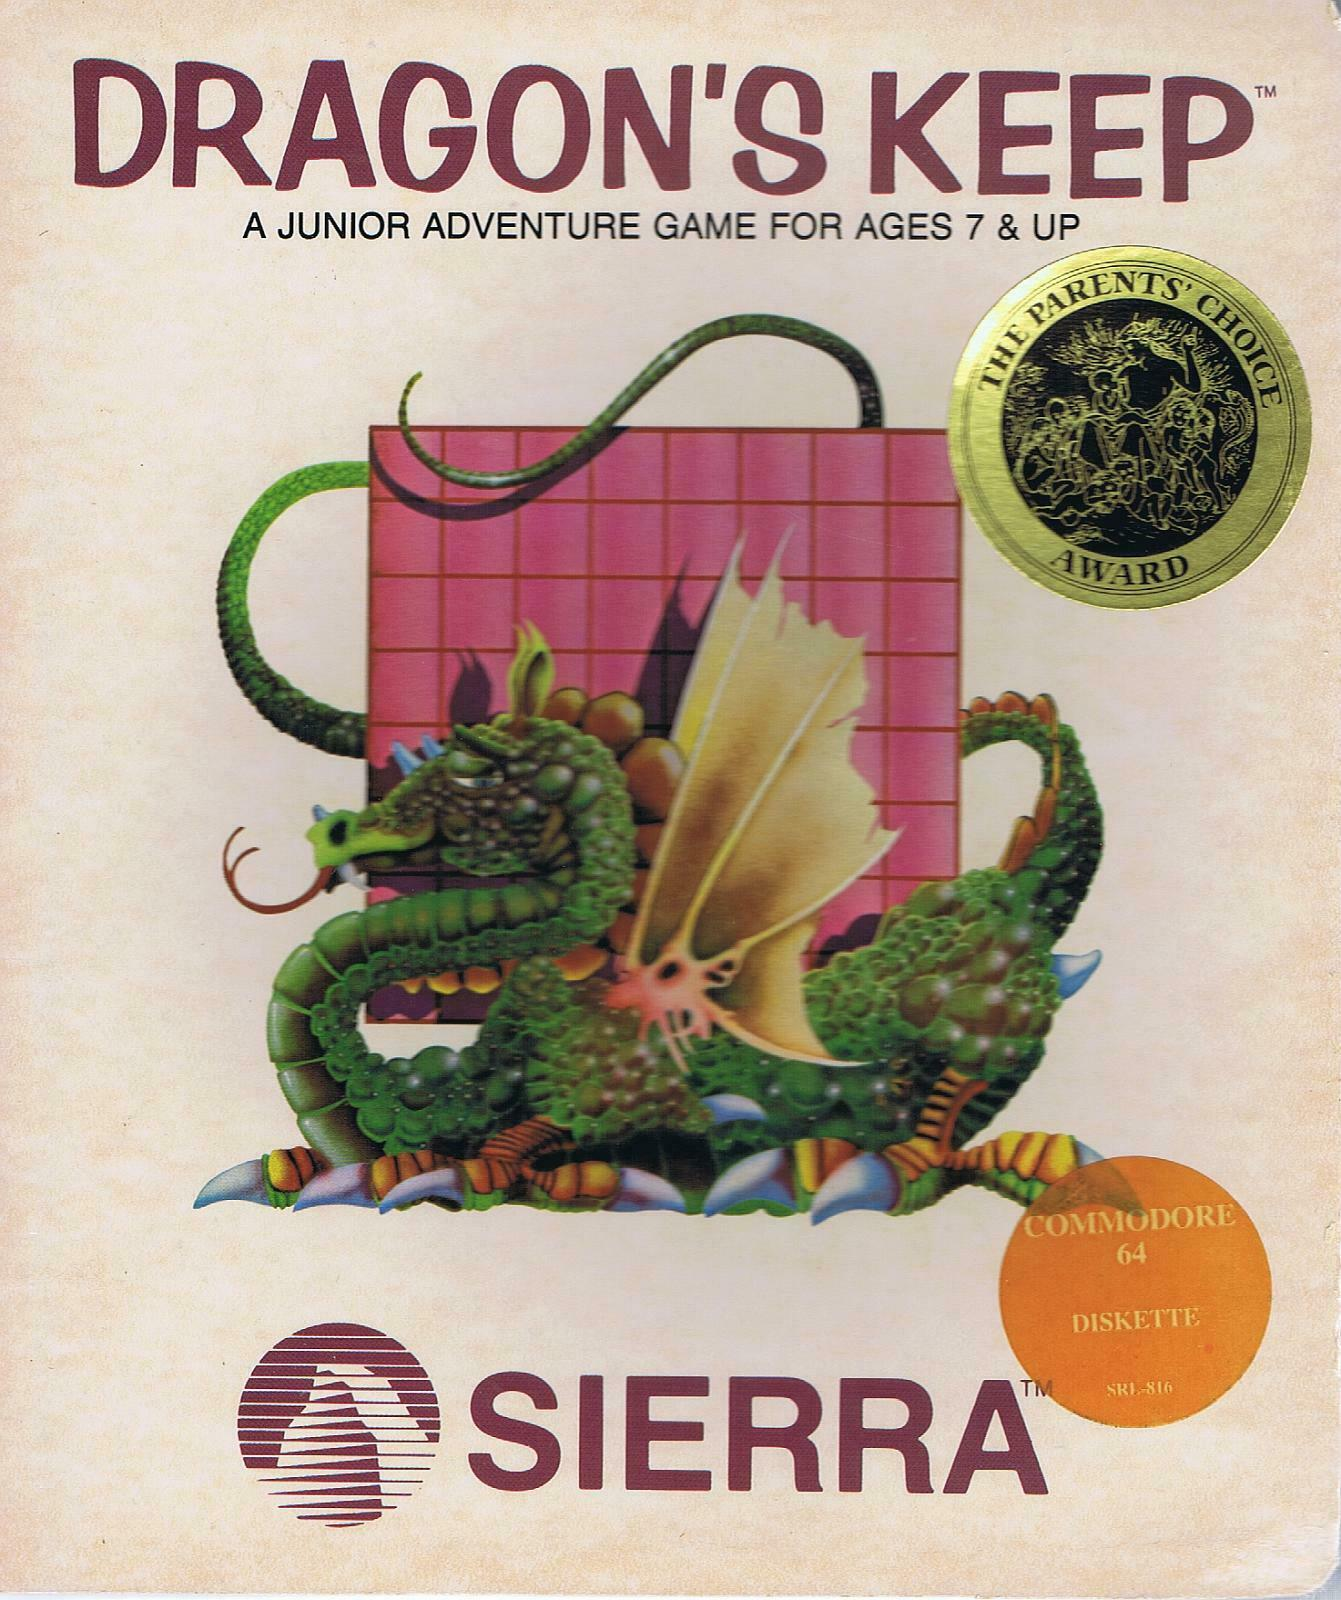 c64-dragon's-keep-sierra-02